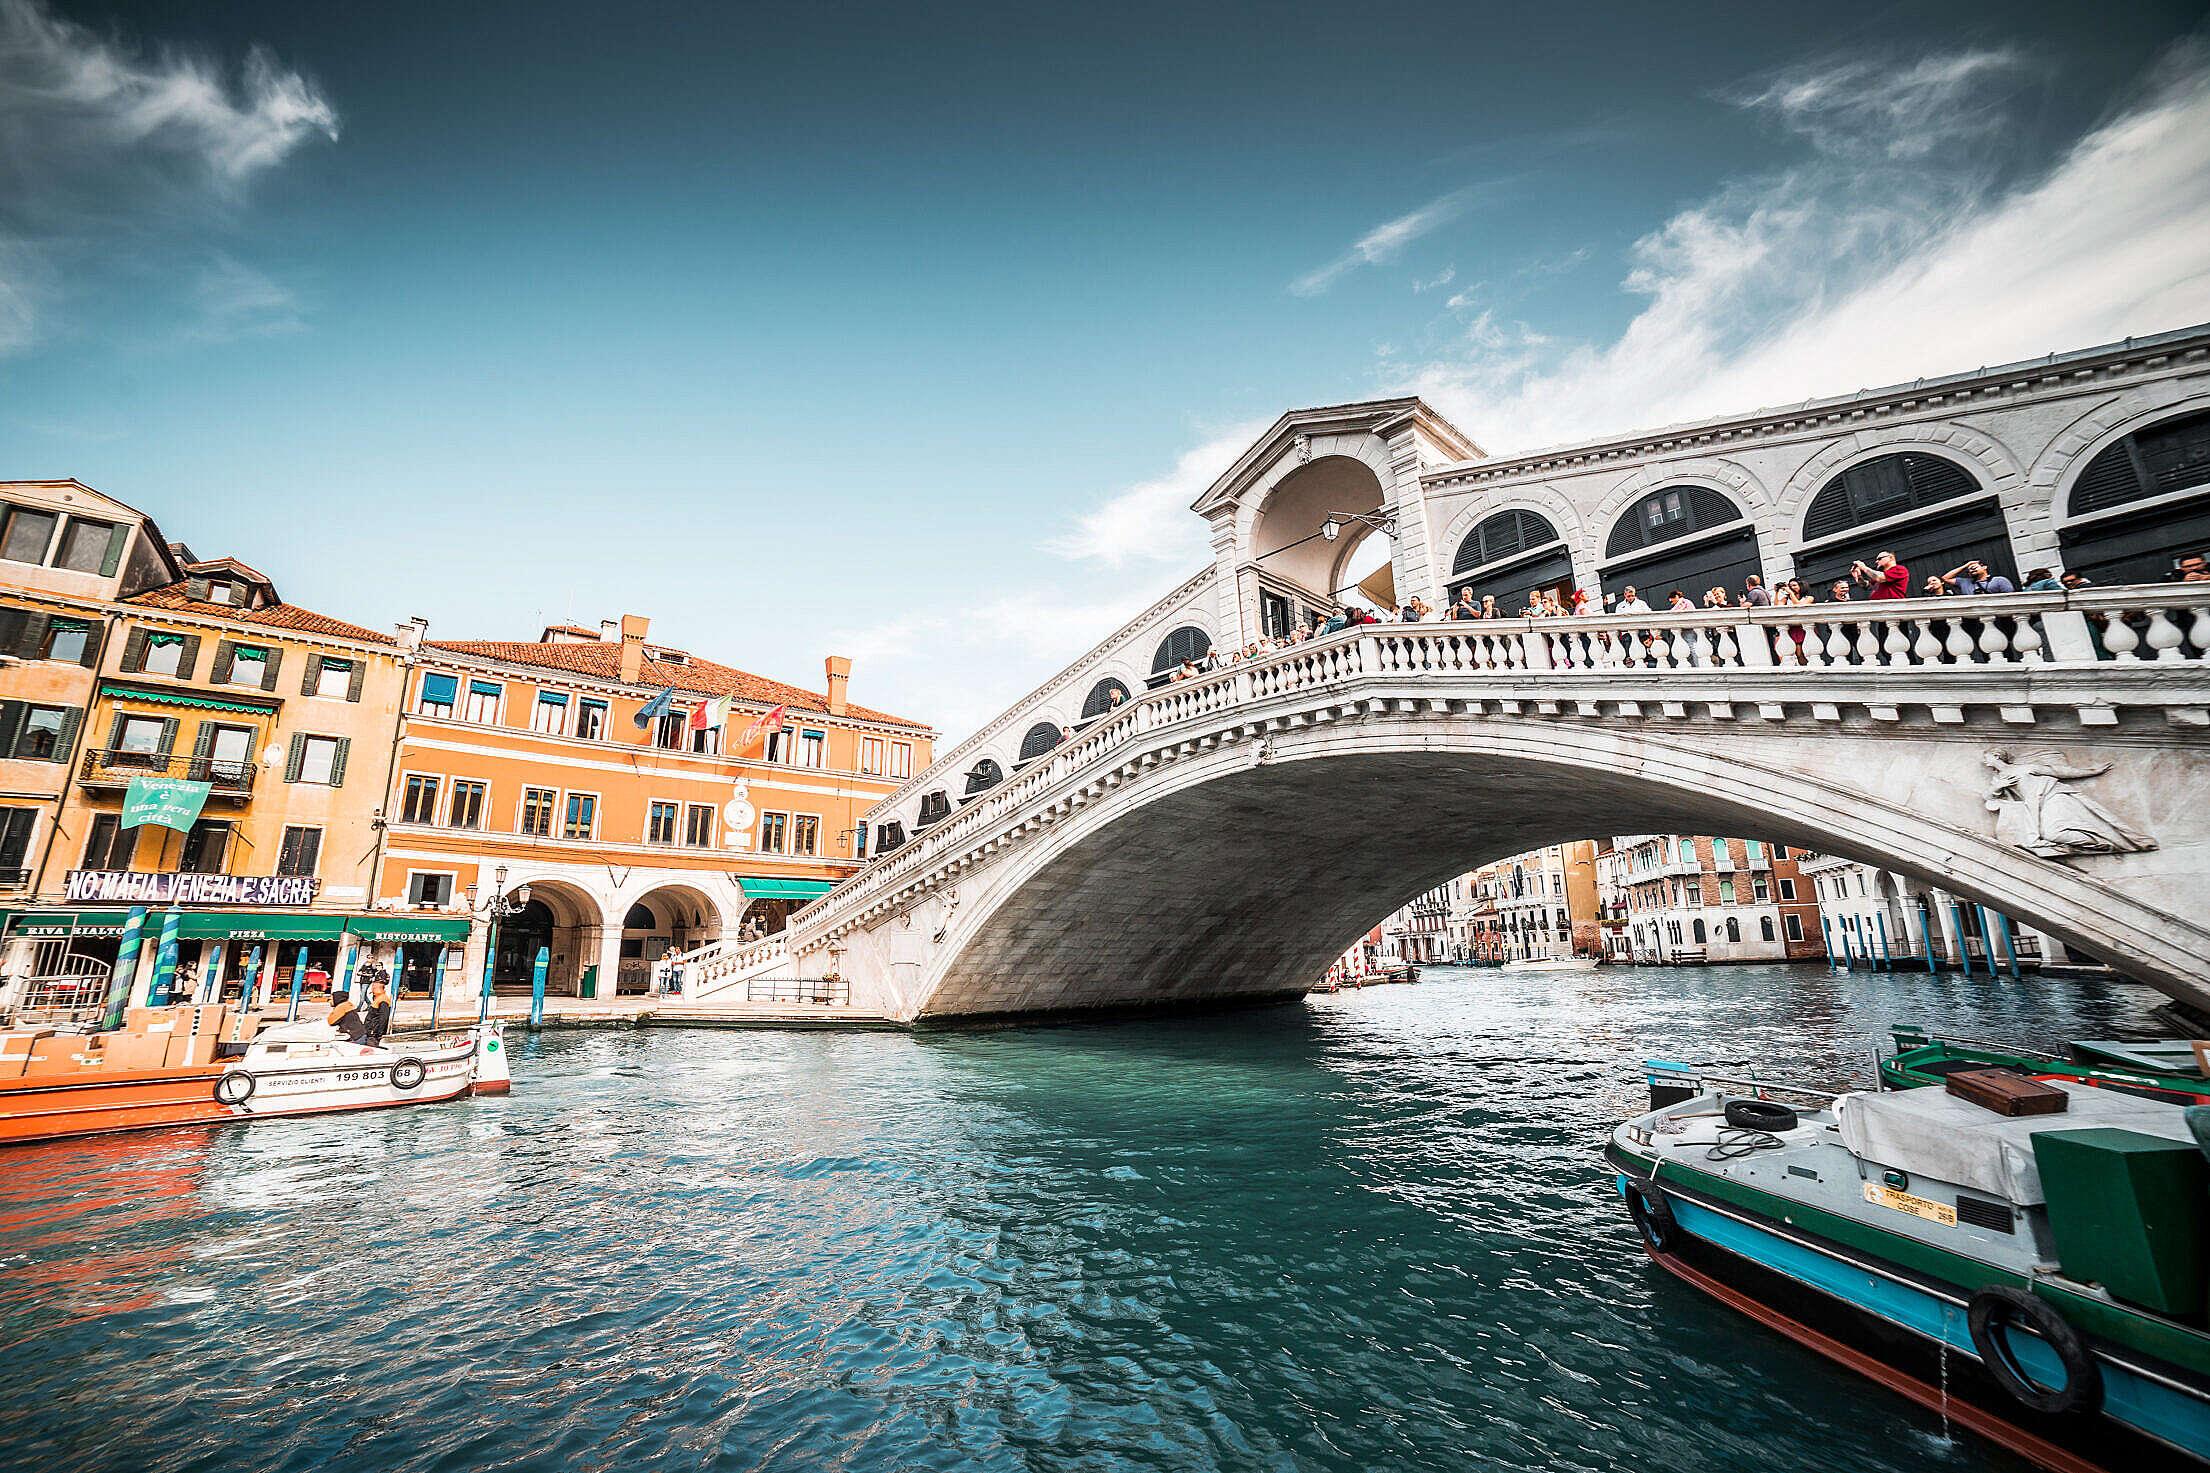 Rialto Bridge in Venice, Italy Free Stock Photo